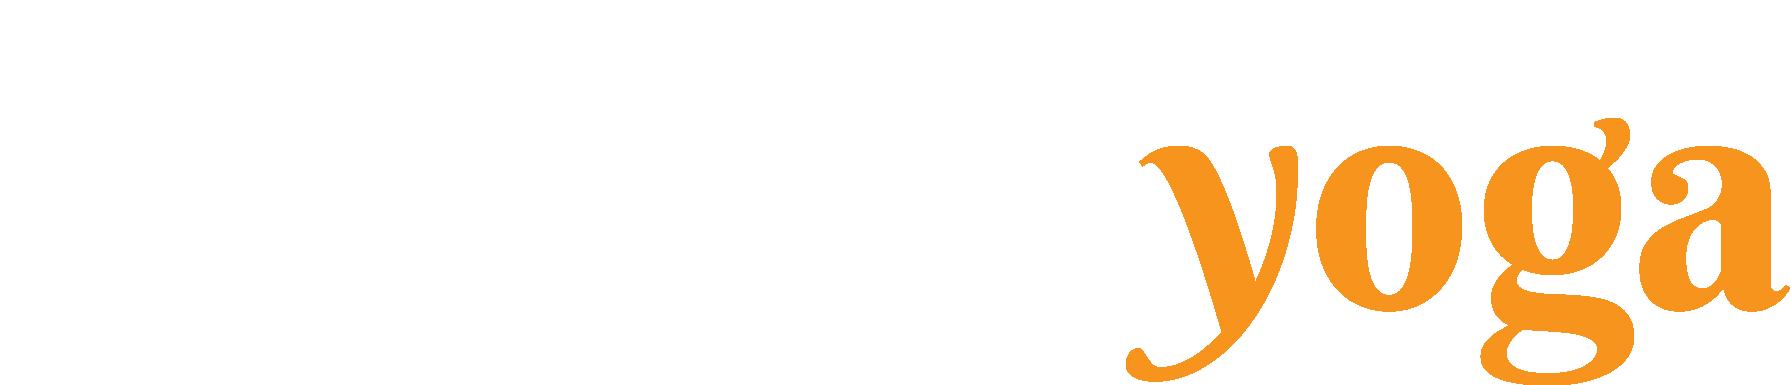 yasamlayoga_logo